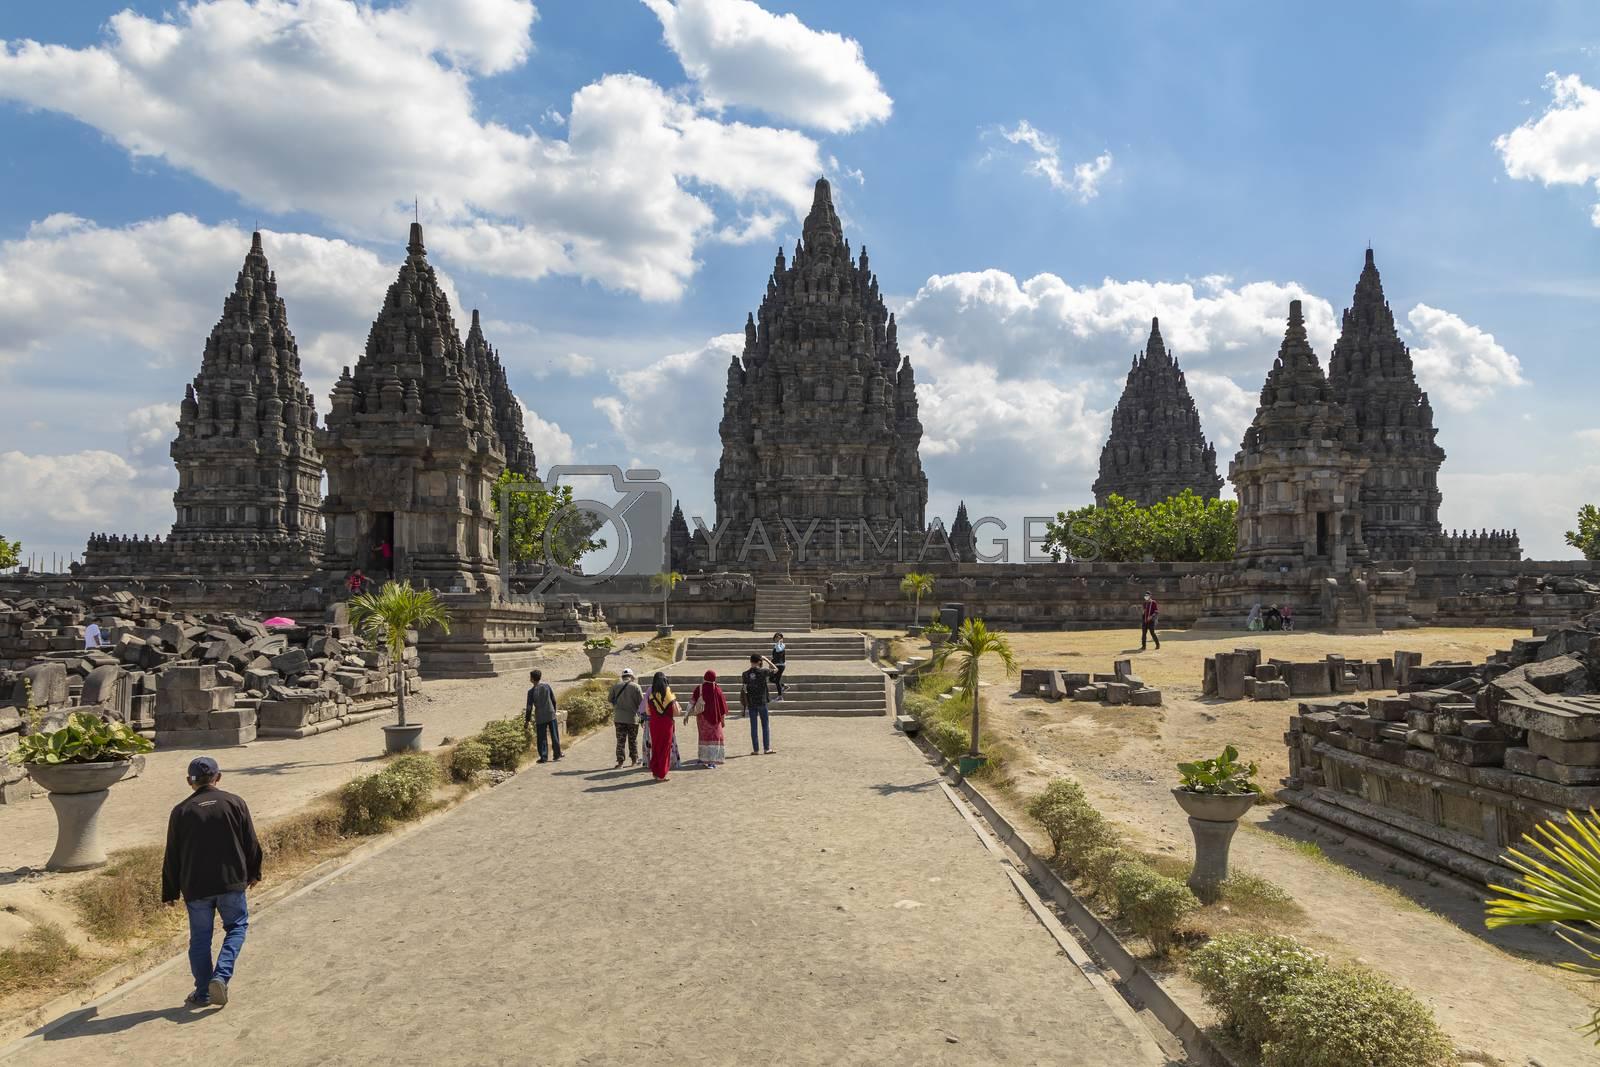 Prambanan, Indonesia - July 17, 2019: Access area to the sanctuaries of the Prambanan ancient Hindu temple complex, Rara Jonggrang, in the special, Yogyakarta region, Indonesia.